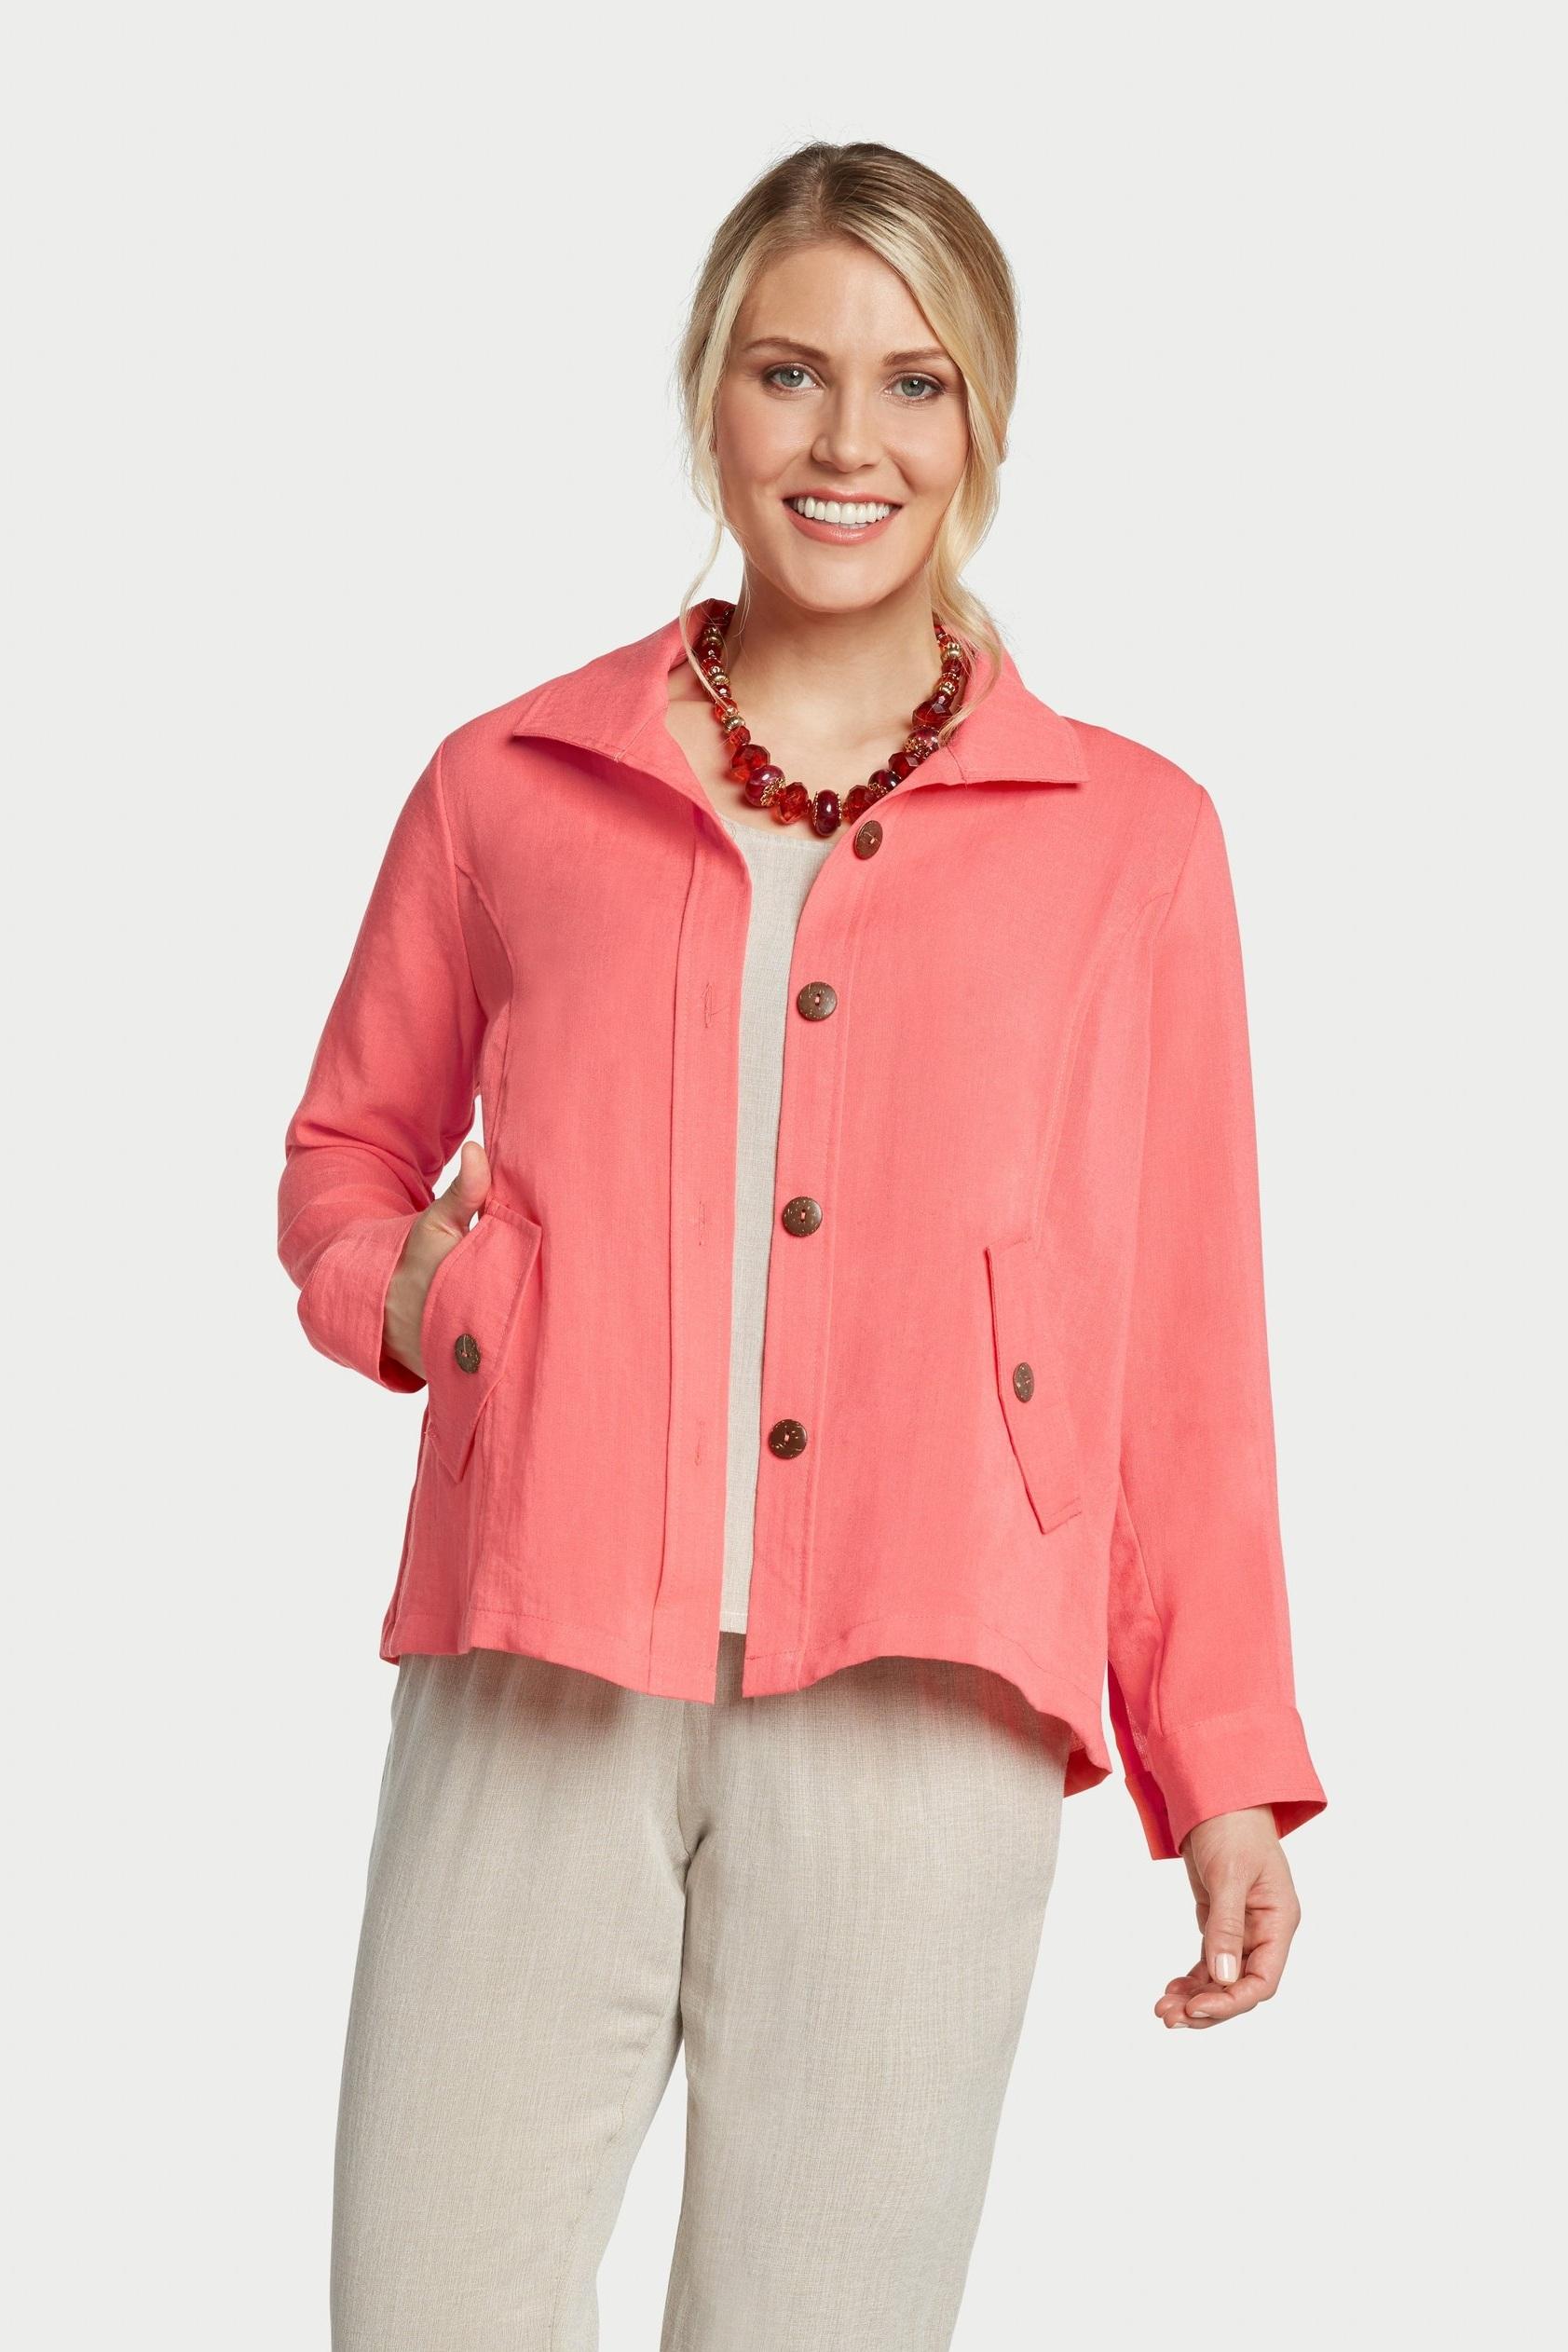 AA242 - Florence False-Flap Pocket Jacket